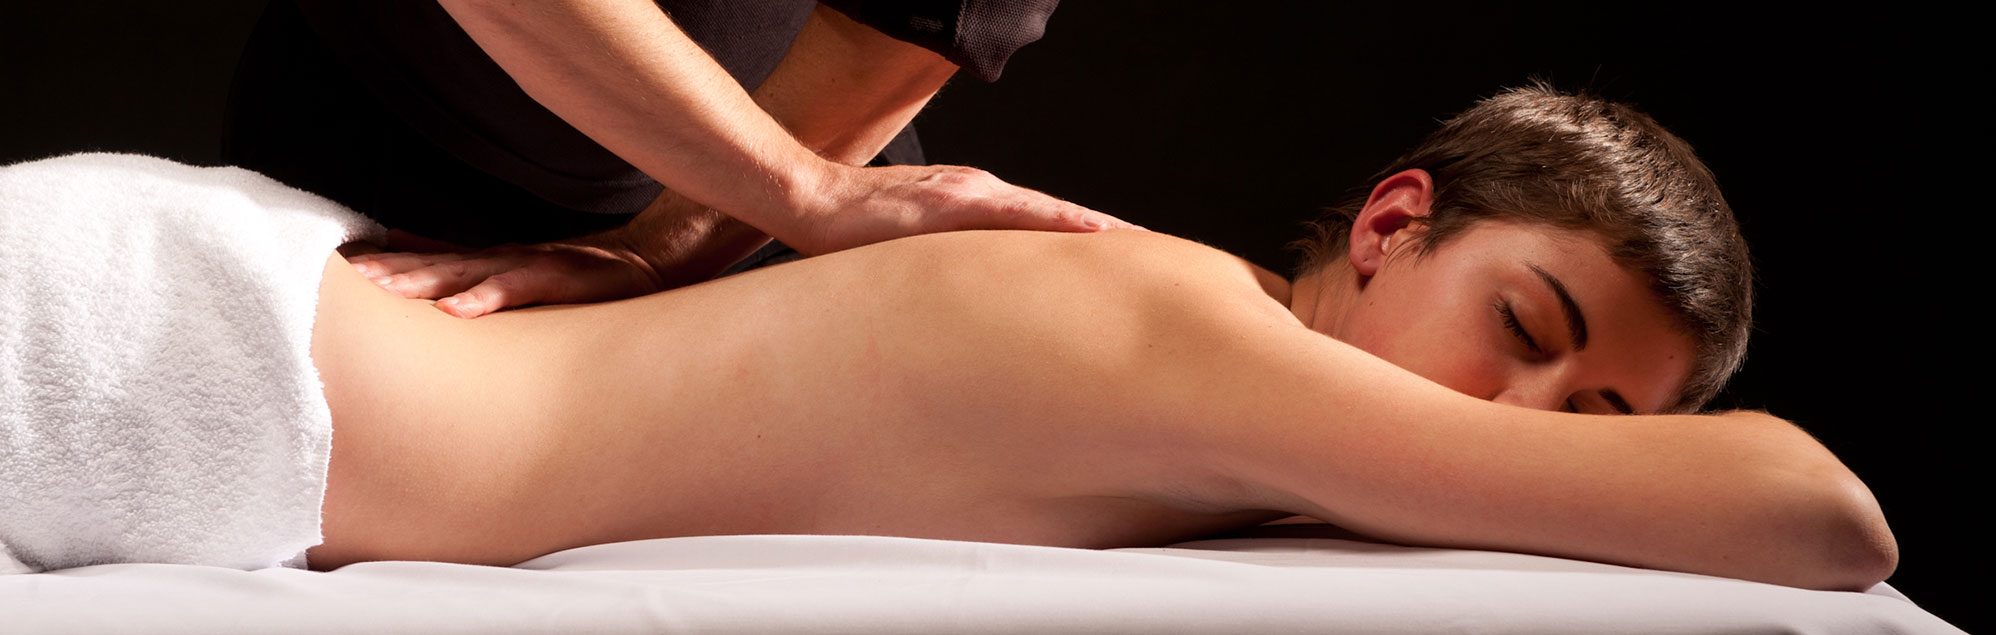 Centre-TMO-physiotherapie-osteopathie-massotherapie-Gatineau-Hull-MGP_4814